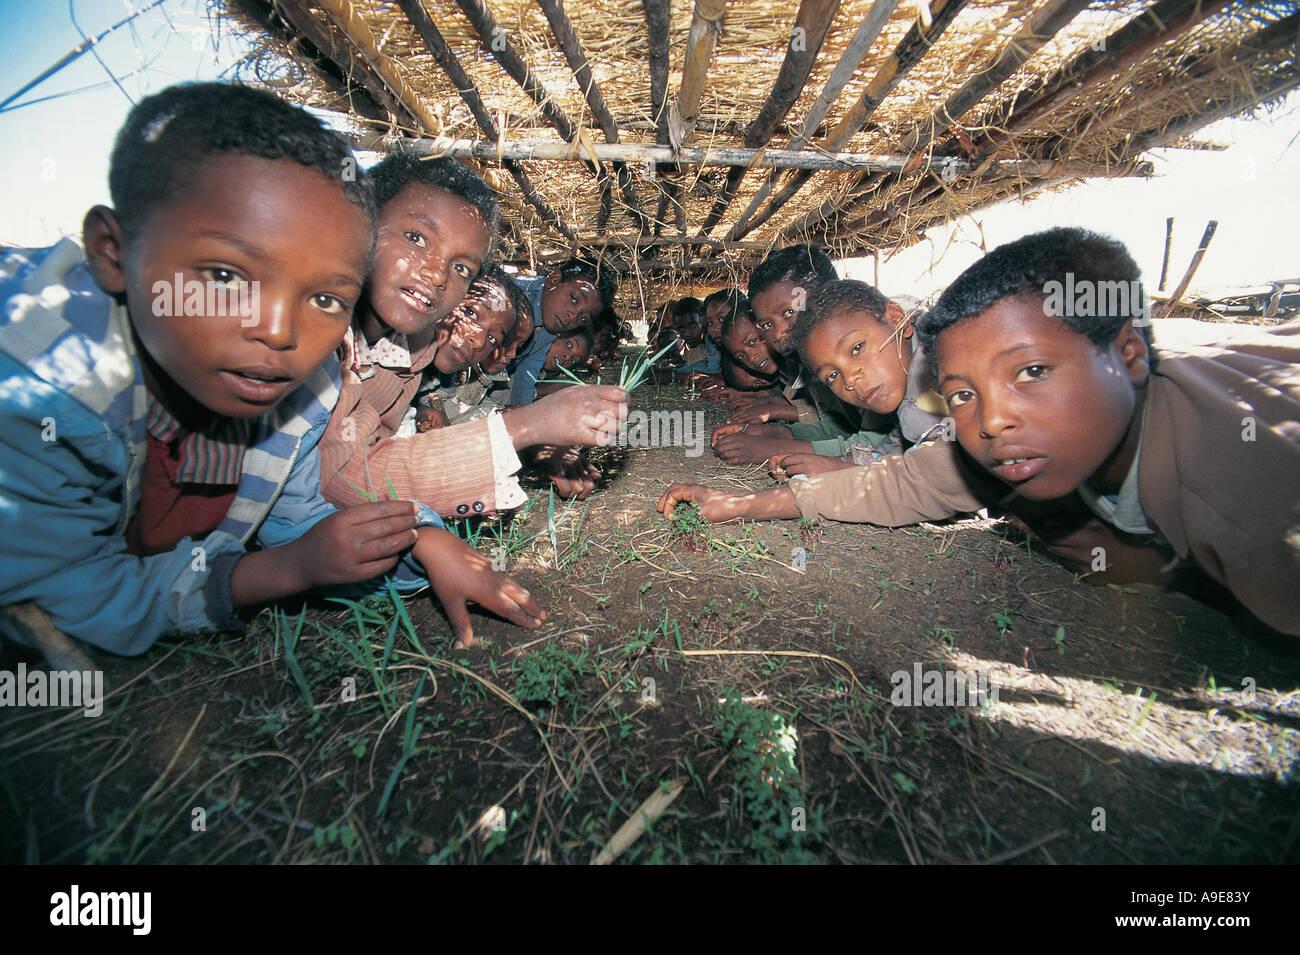 School nursery education program selling saplings for school book money Ginchi Ethiopia - Stock Image